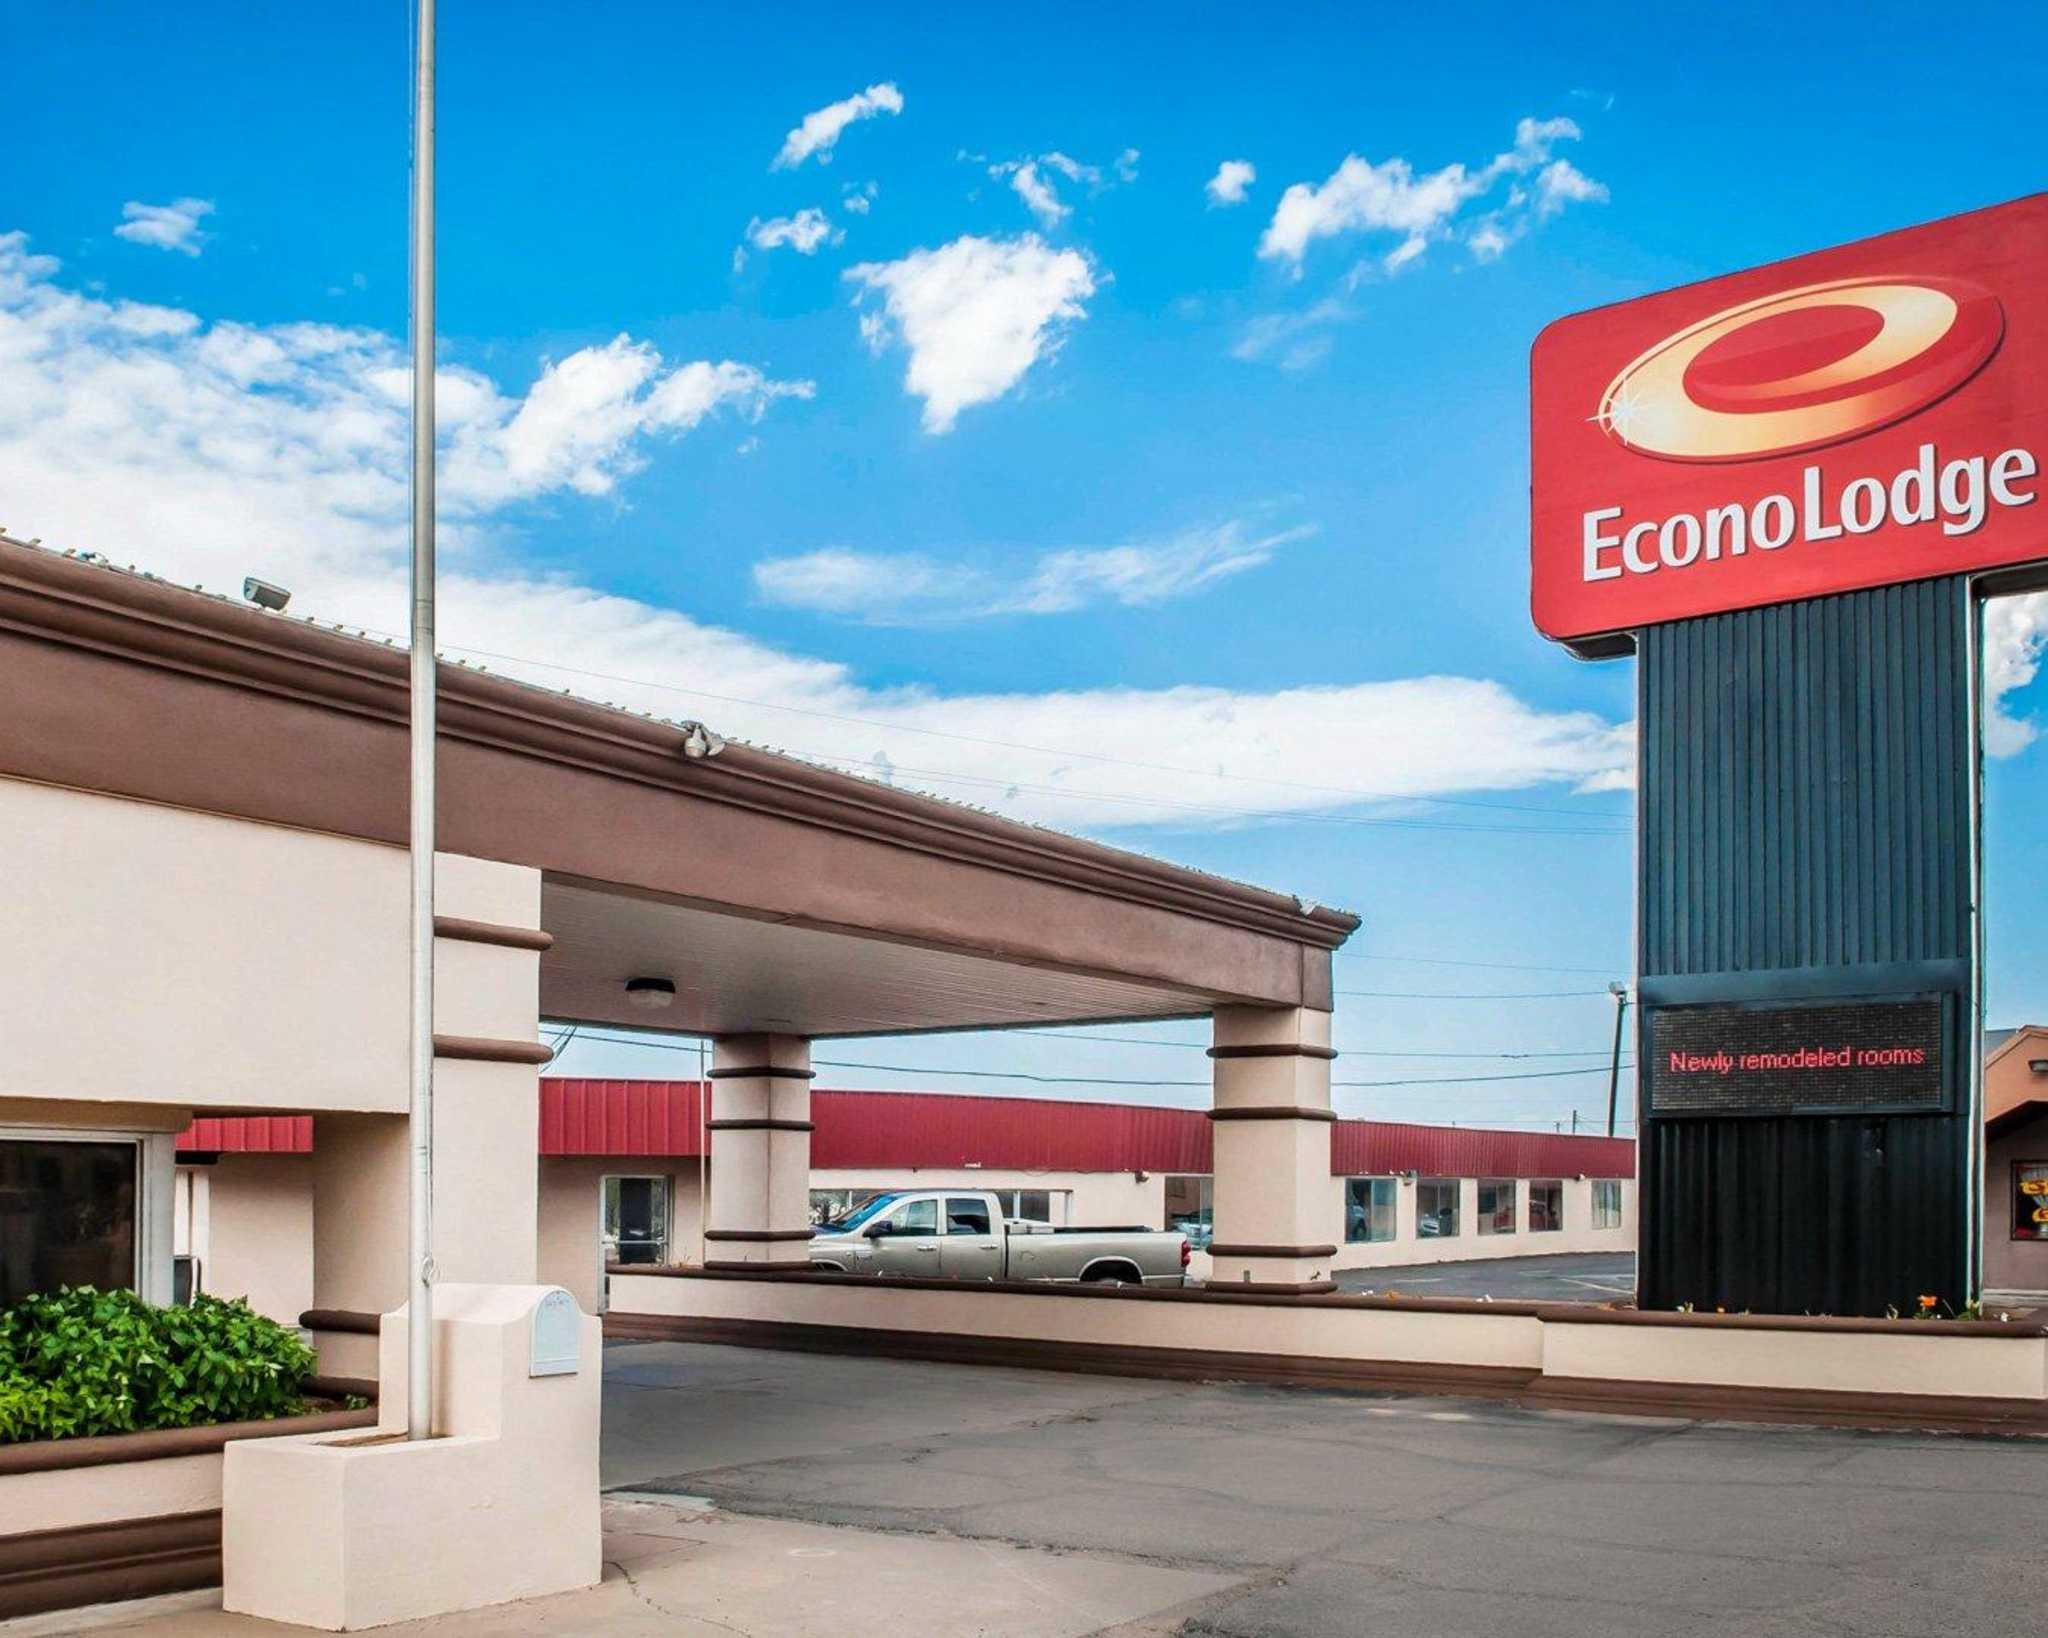 Econo Lodge Clovis New Mexico Nm